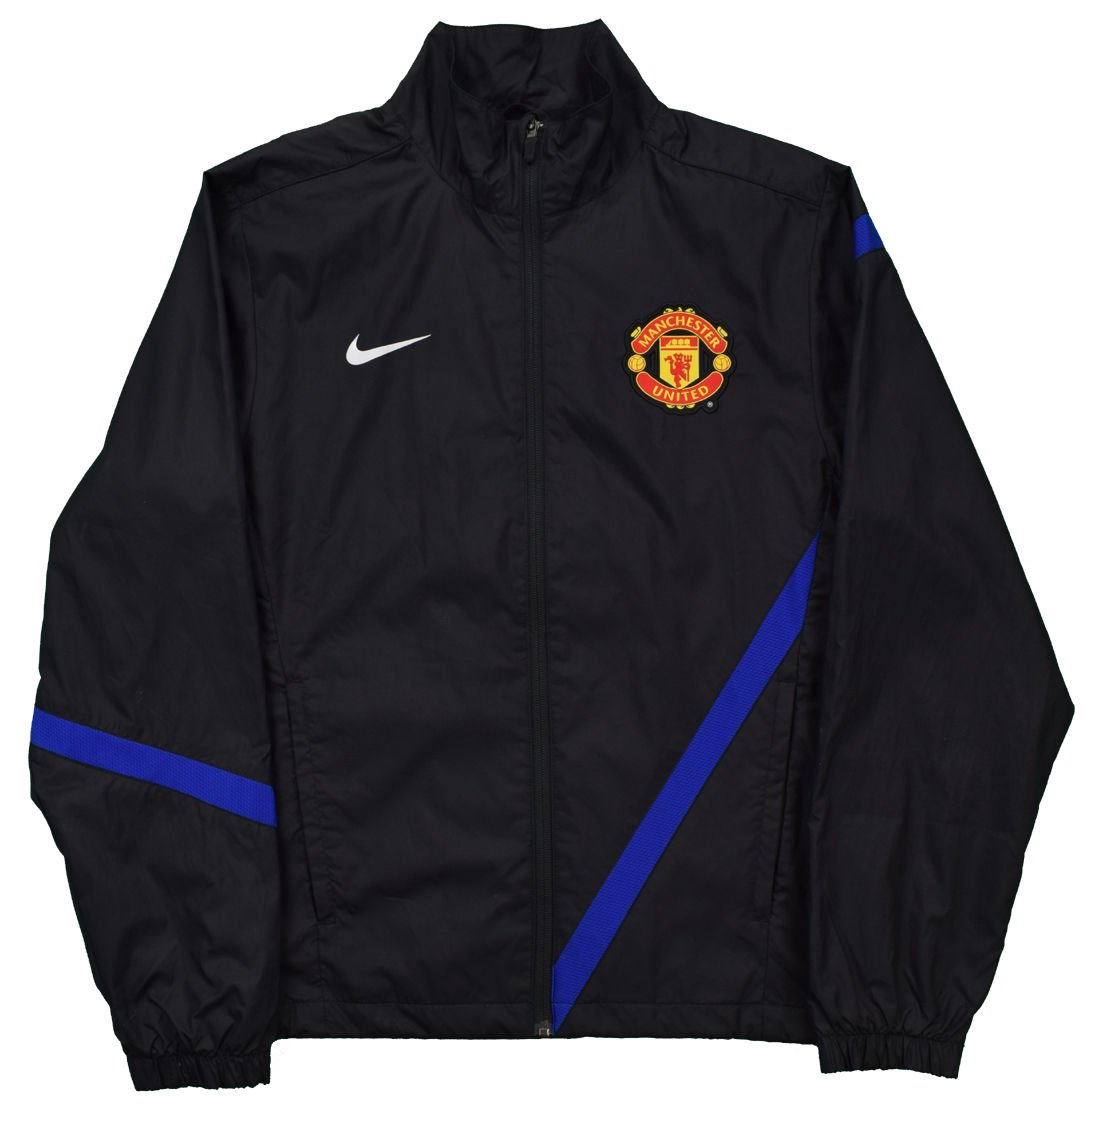 United S Manchester Manchester Jacket United PwOk08n